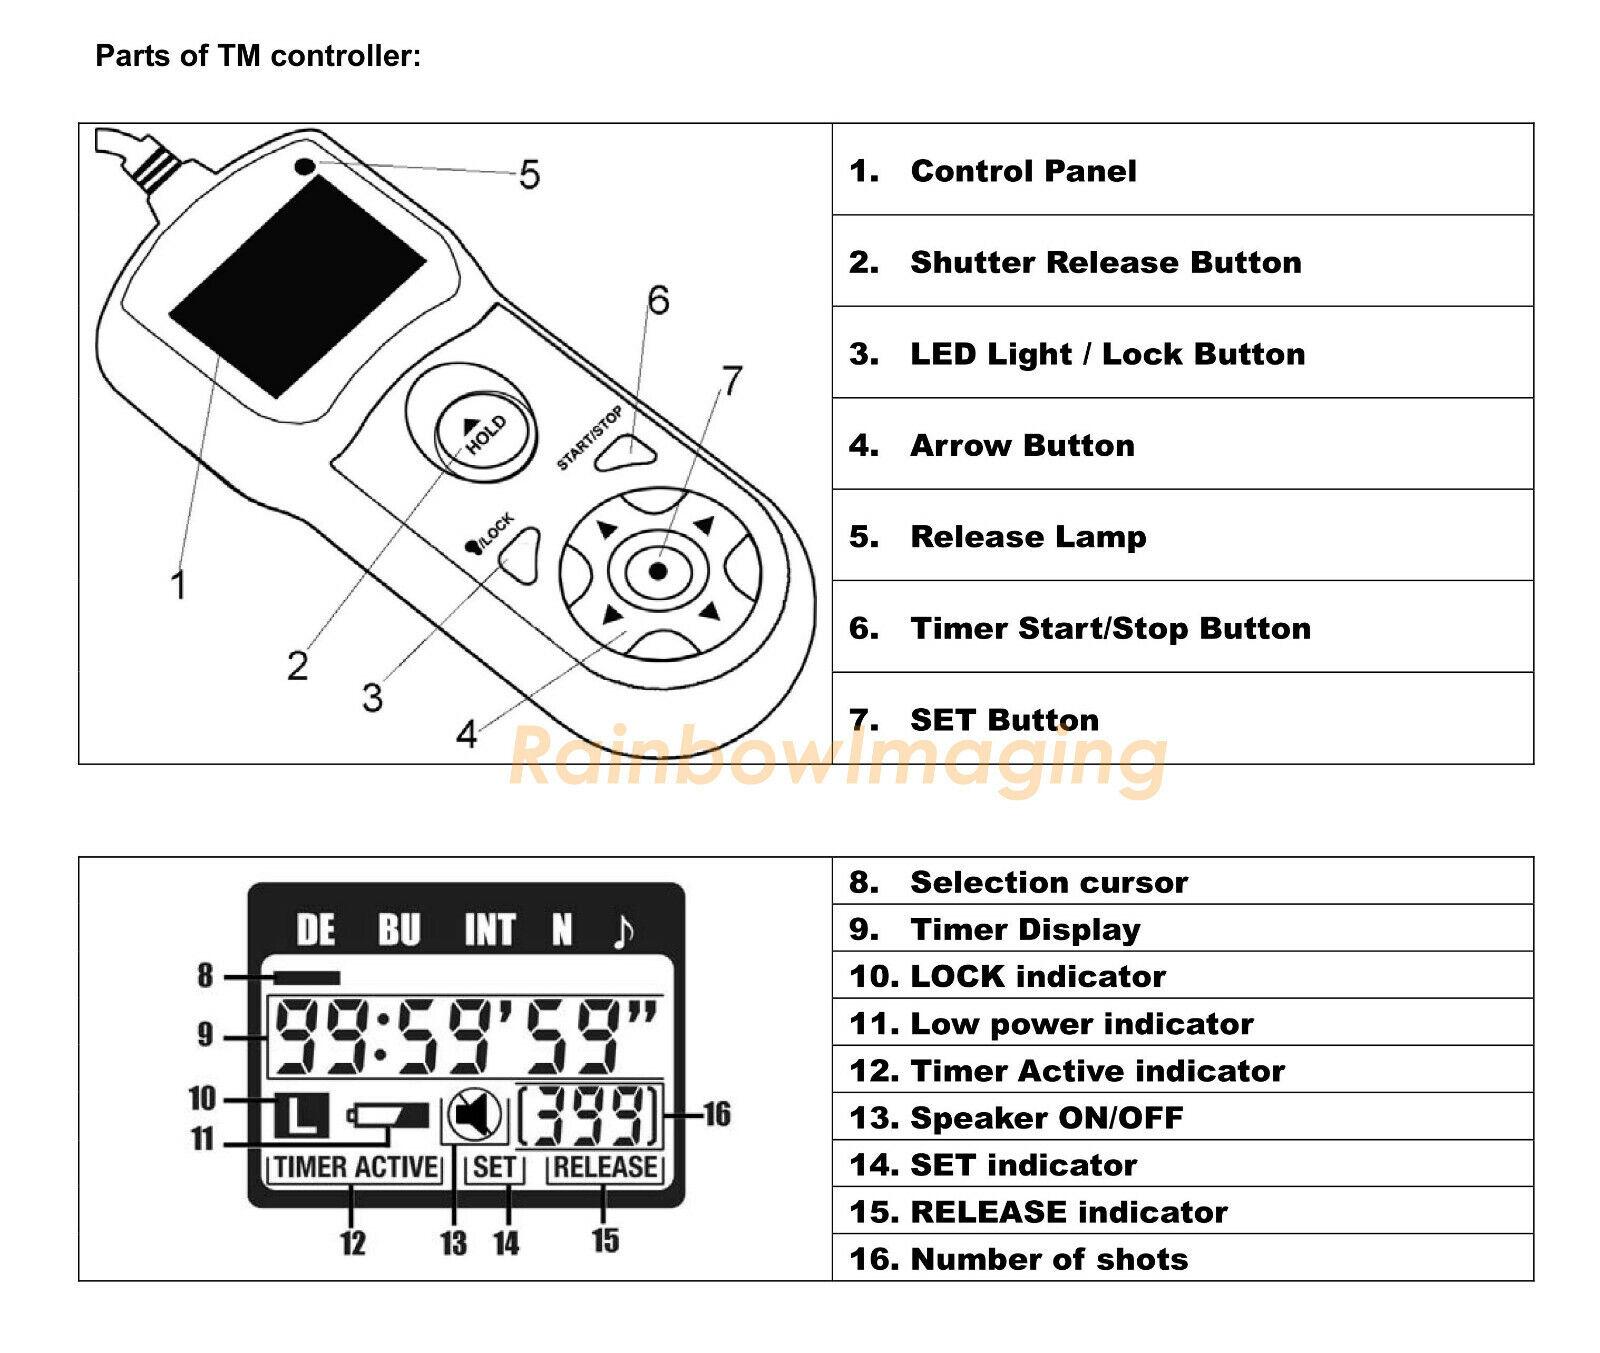 Jarolift Shutter Control Timer Timer Handheld Transmitter Radio Remote Control